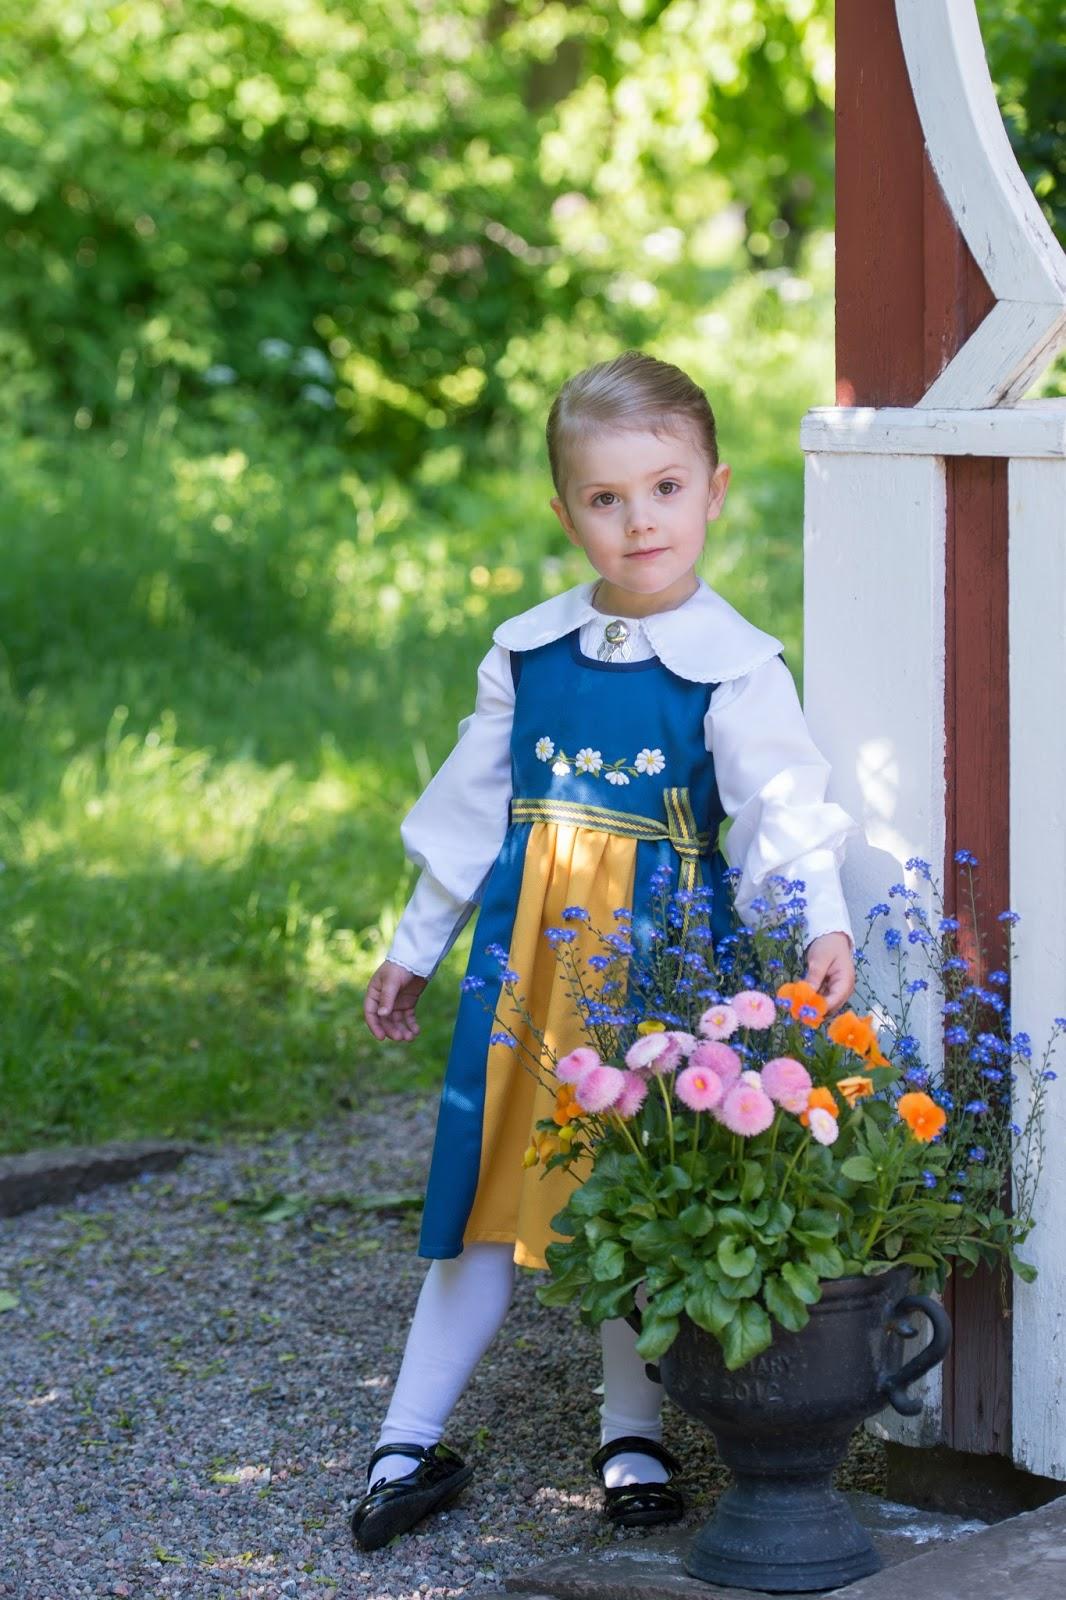 Prinsessan_Estelle_i_Sverigedra_kt._Foto_Kate_Gabor_Kungahuset.se_